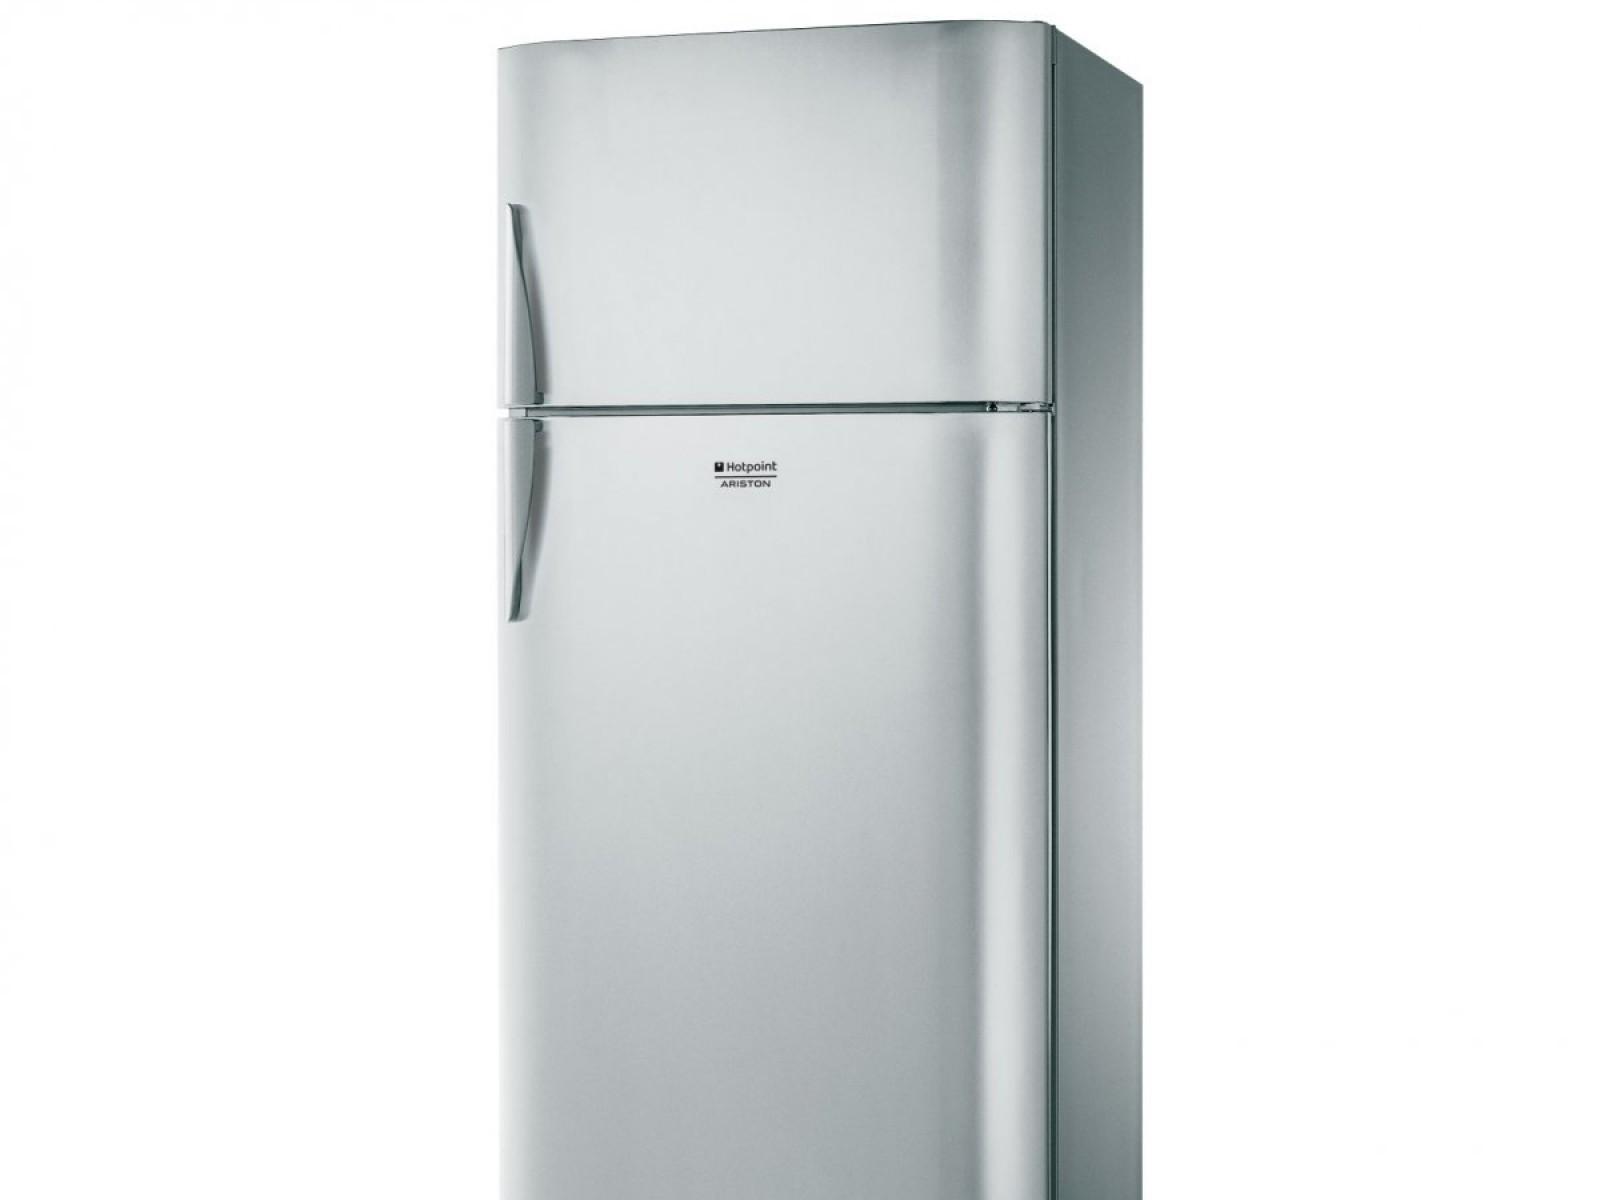 Proposte d 39 arredo cucine promozione frigo di proposte for Frigo arredo